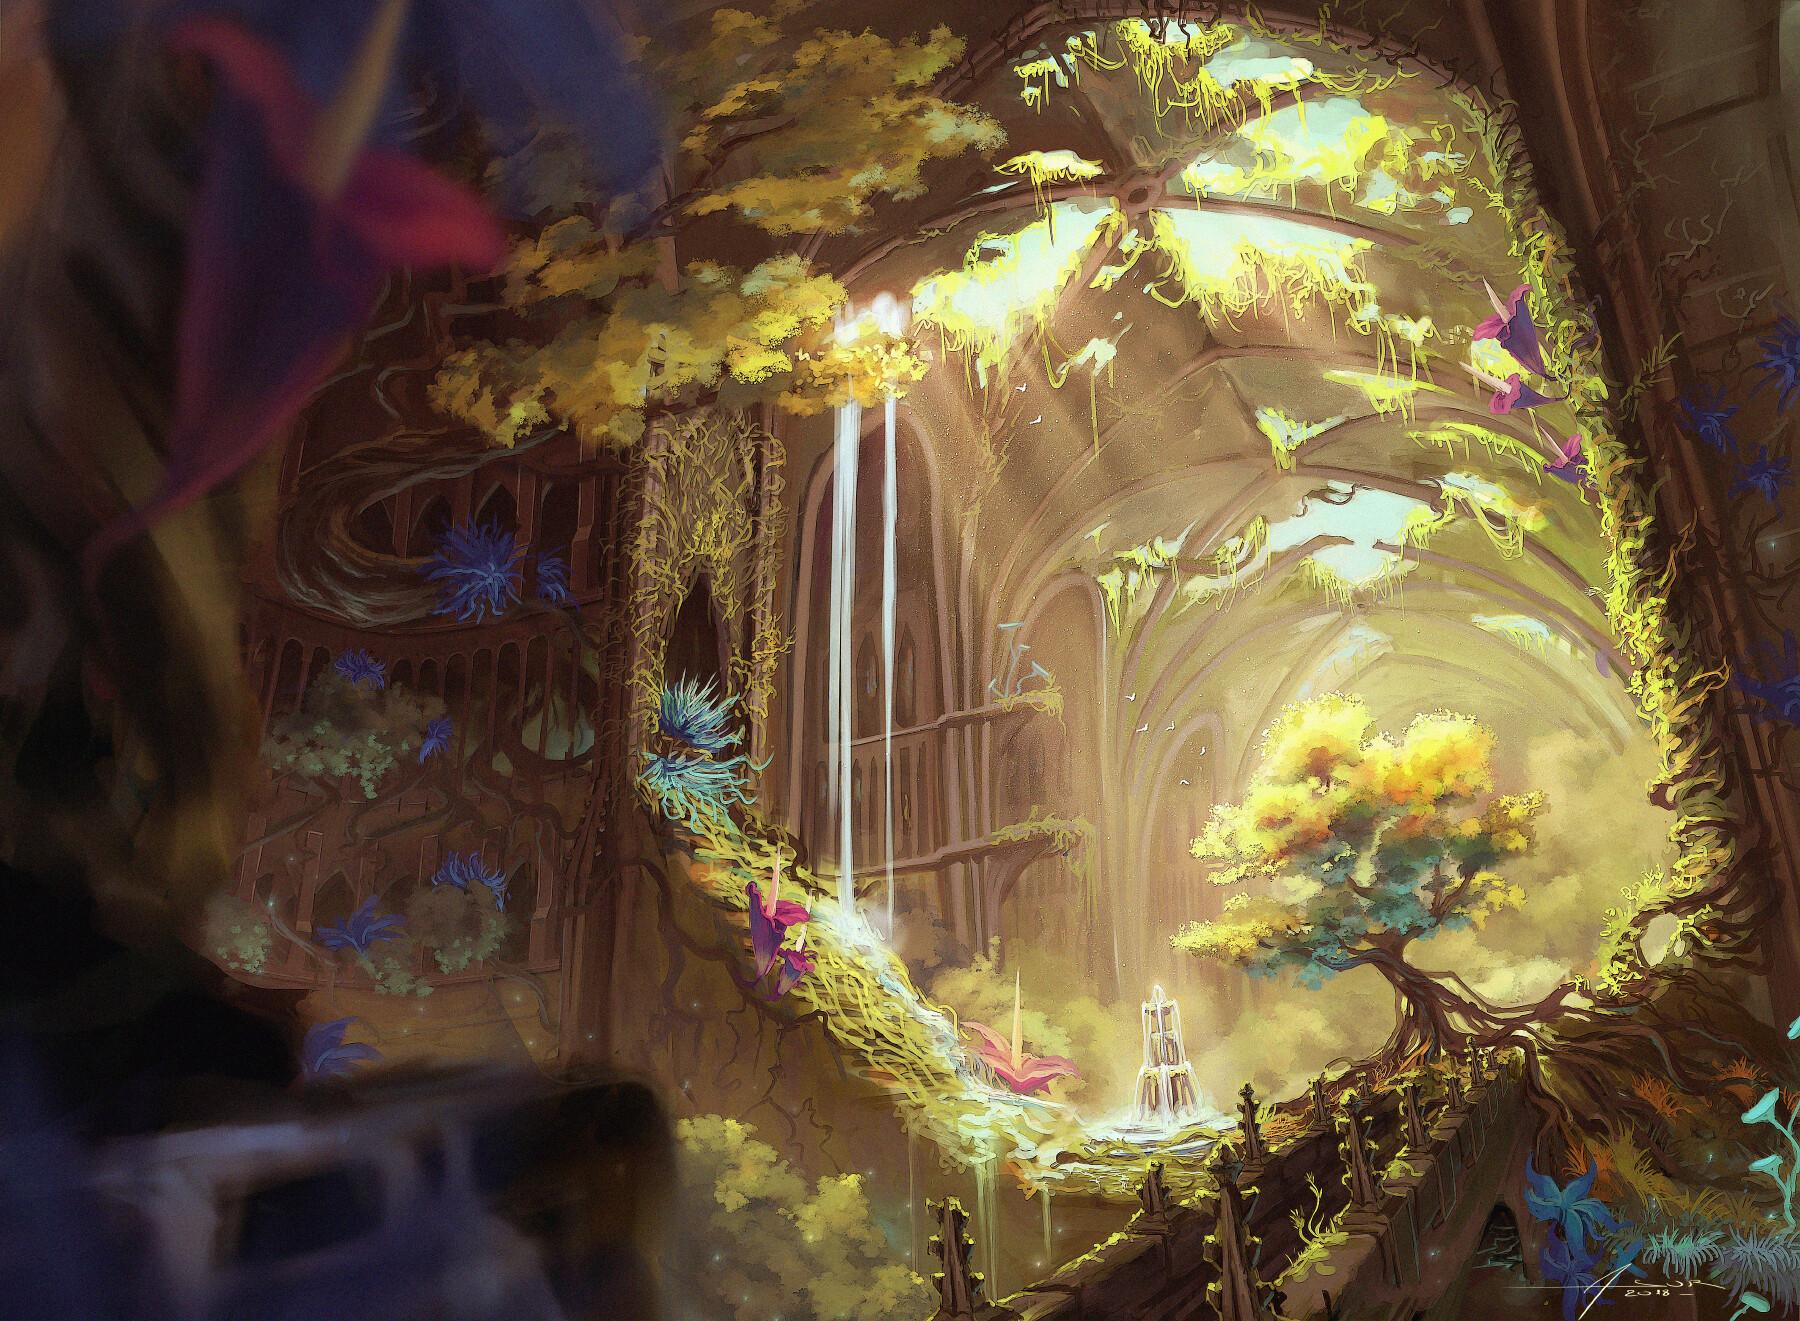 Imaginative & Dreamy Paintings by Asur Misoa